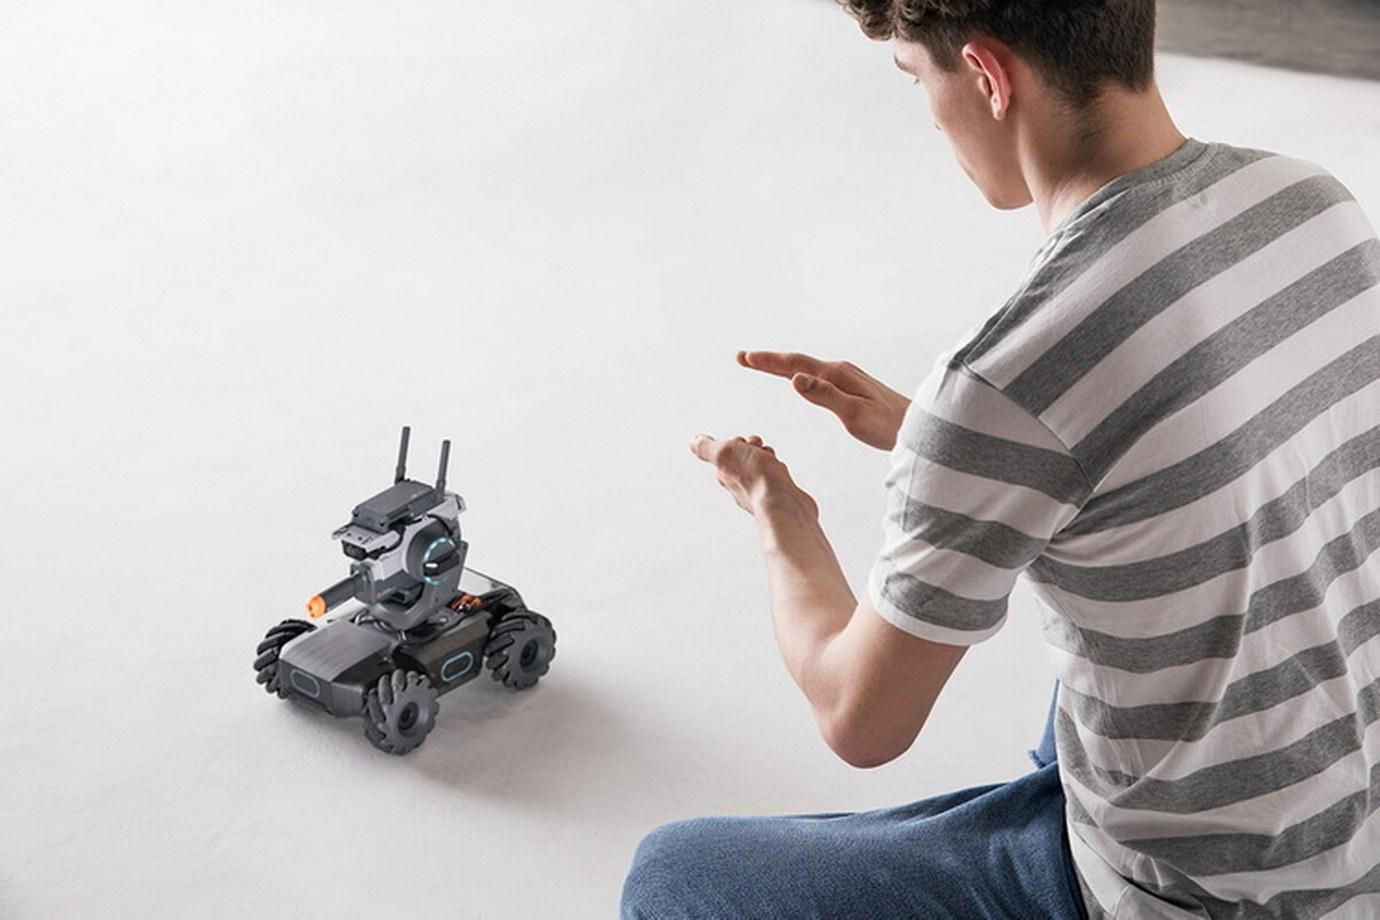 Robomaster S1-Clap Recognition